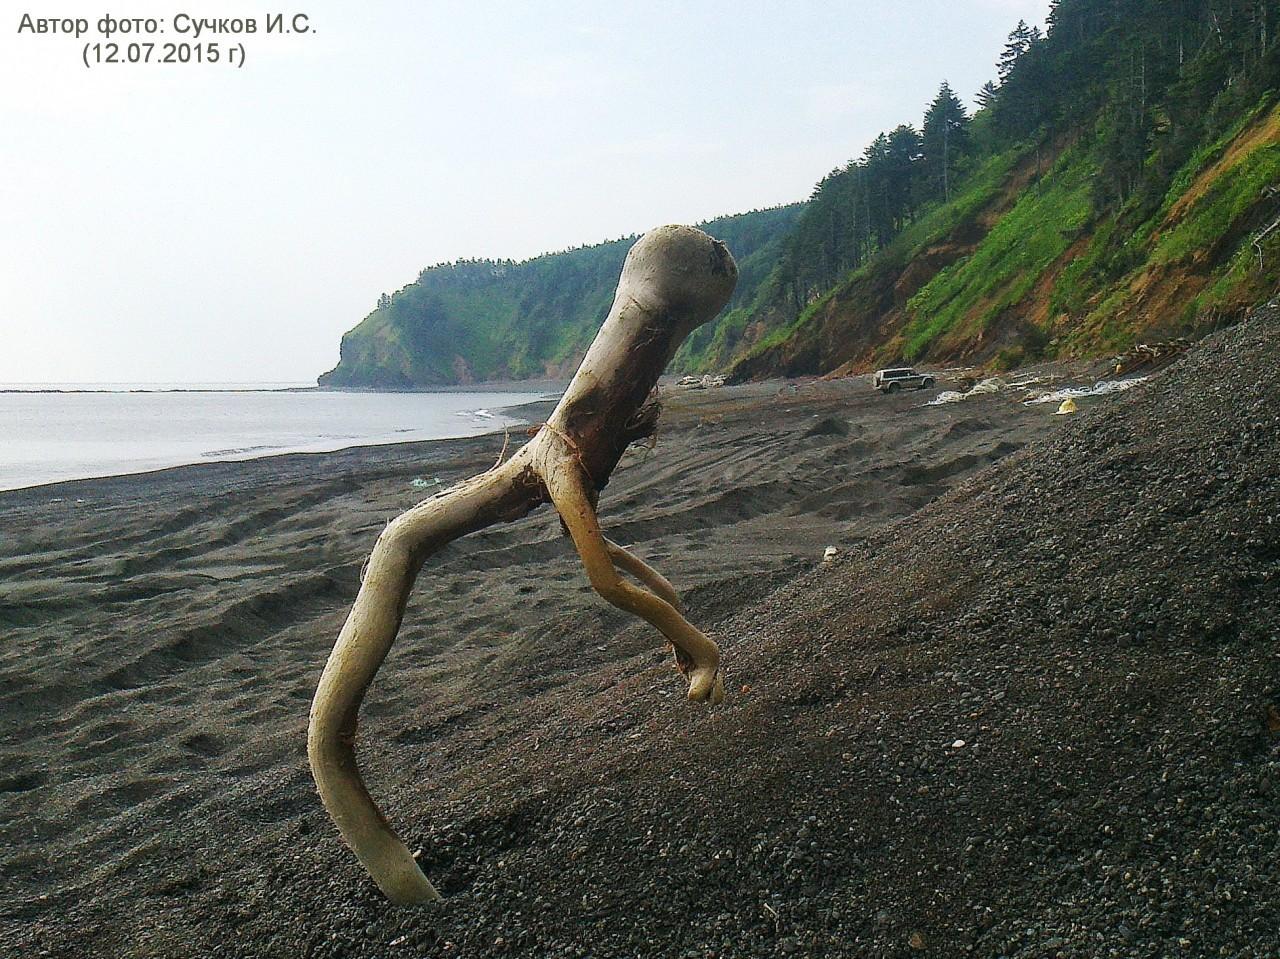 7388PetVladVik: Прогулки по берегу моря.